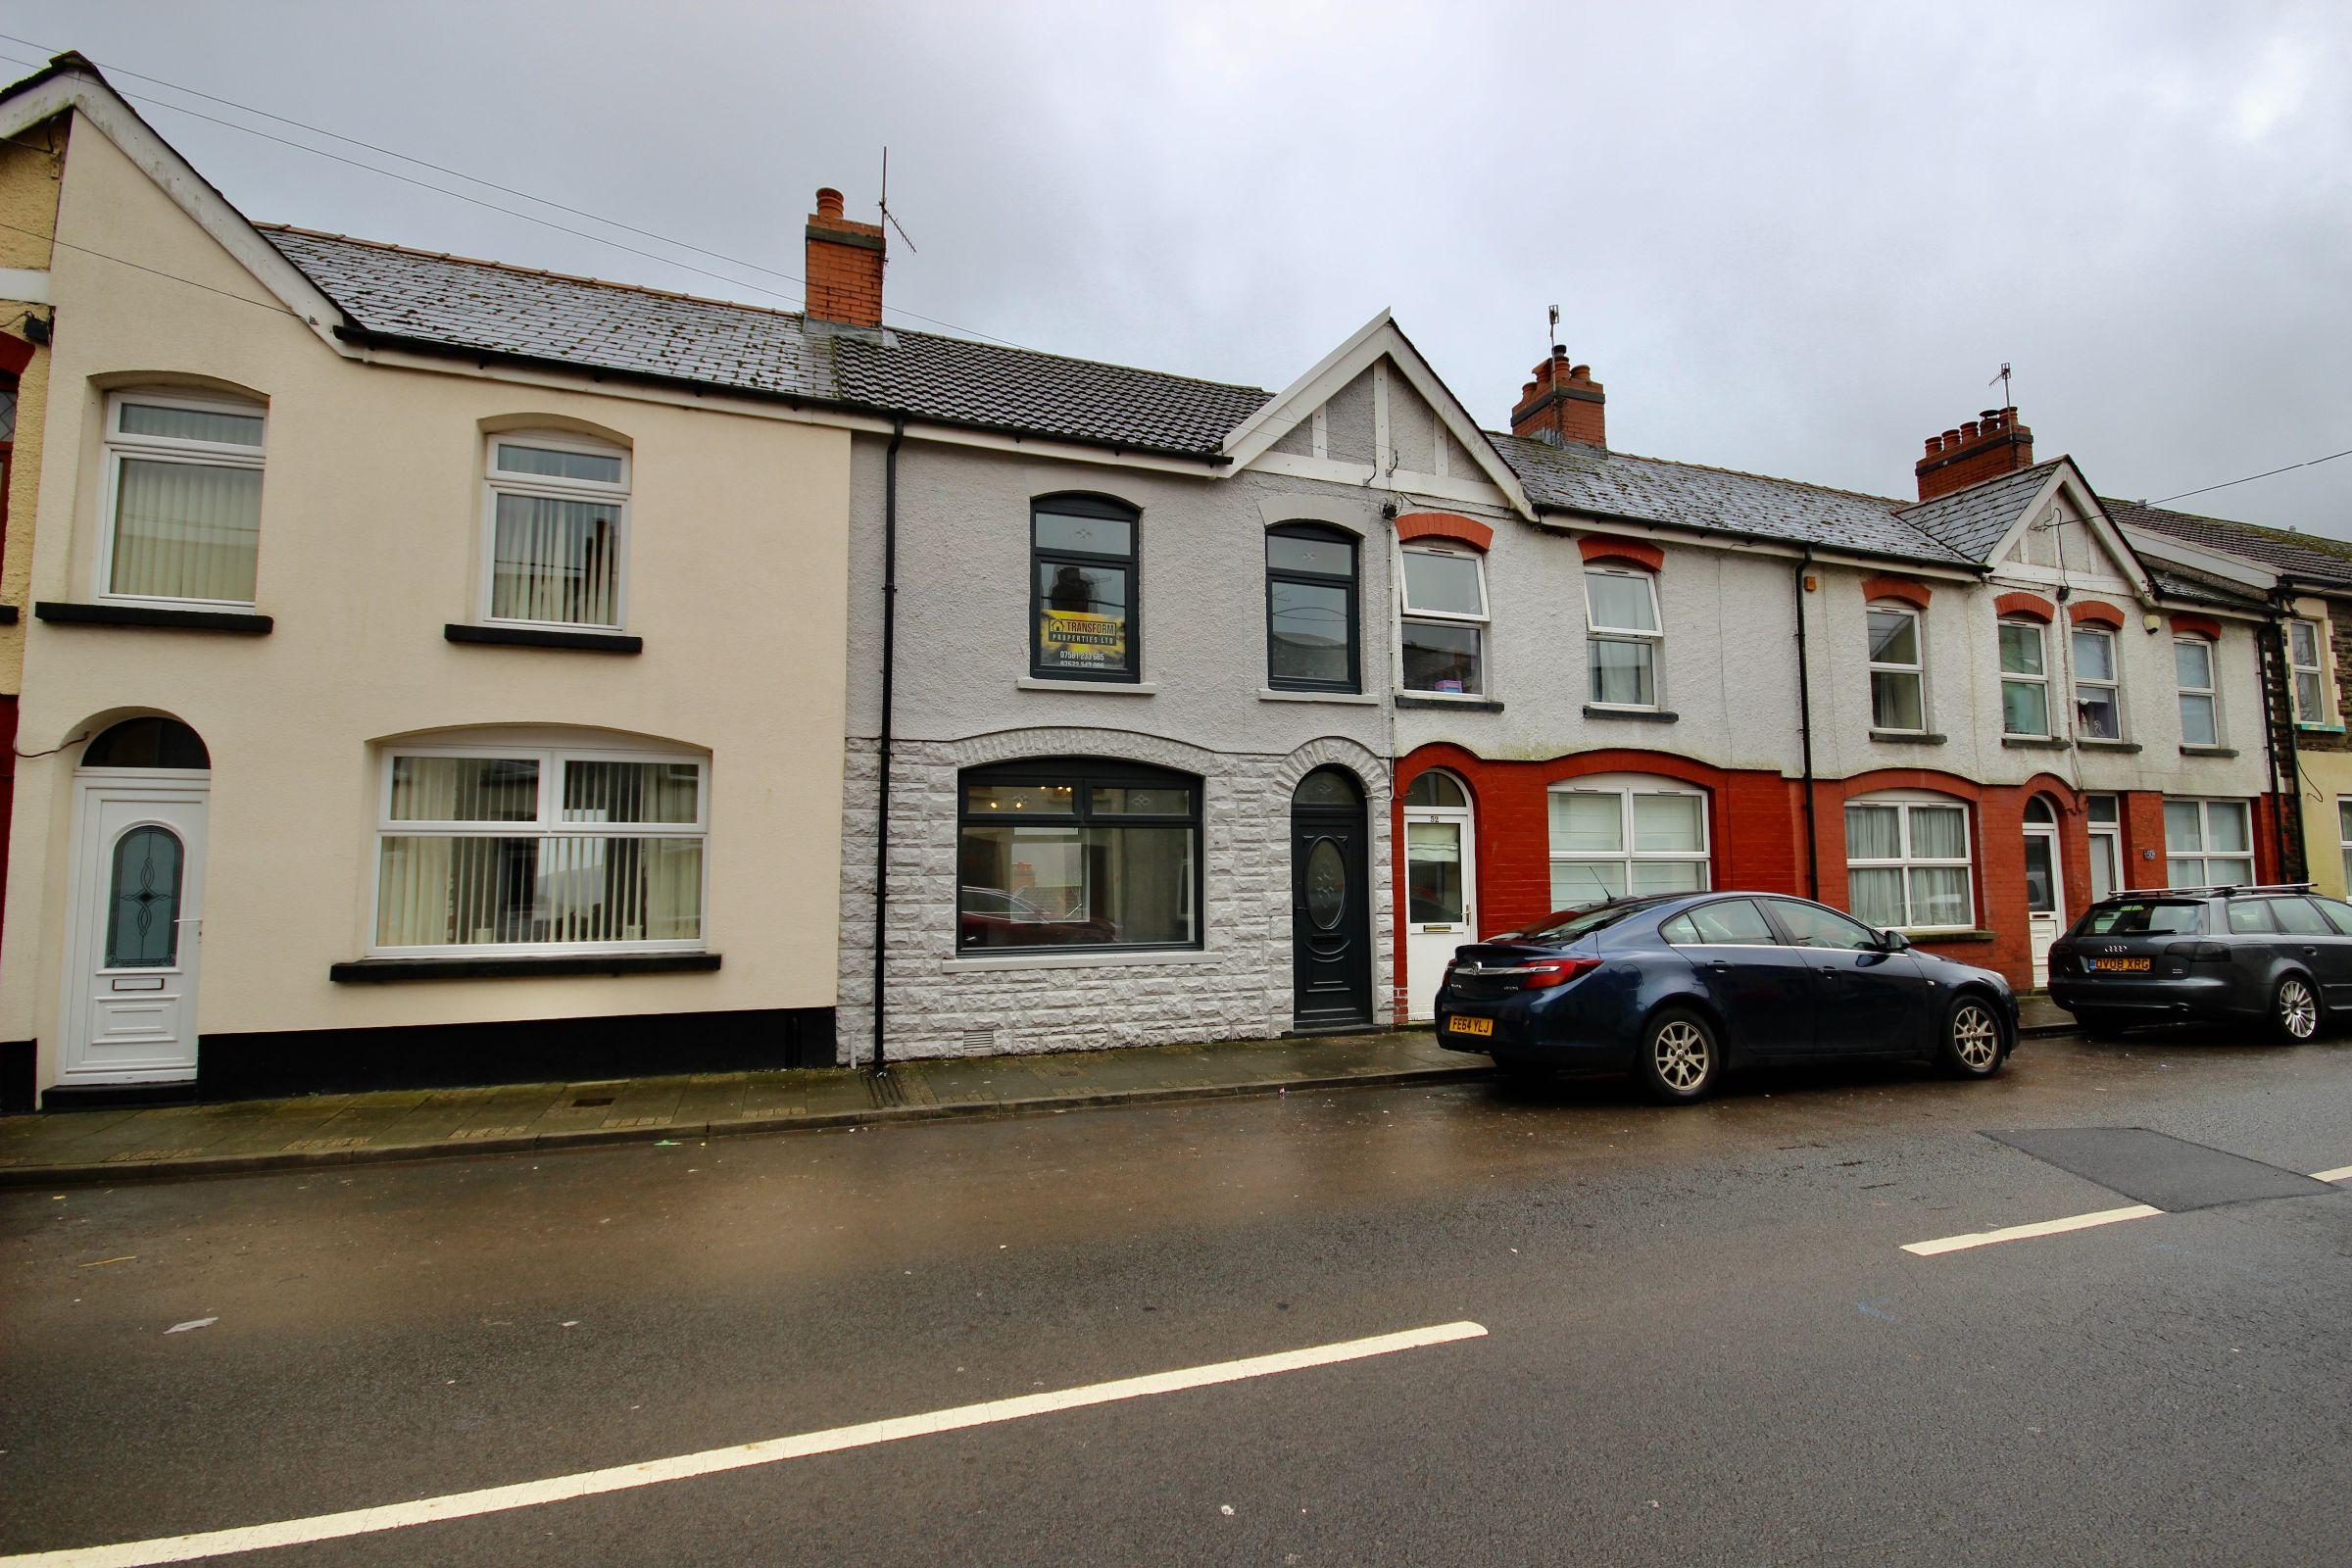 Charles Street, Abertysswg, Rhymney, Tredegar